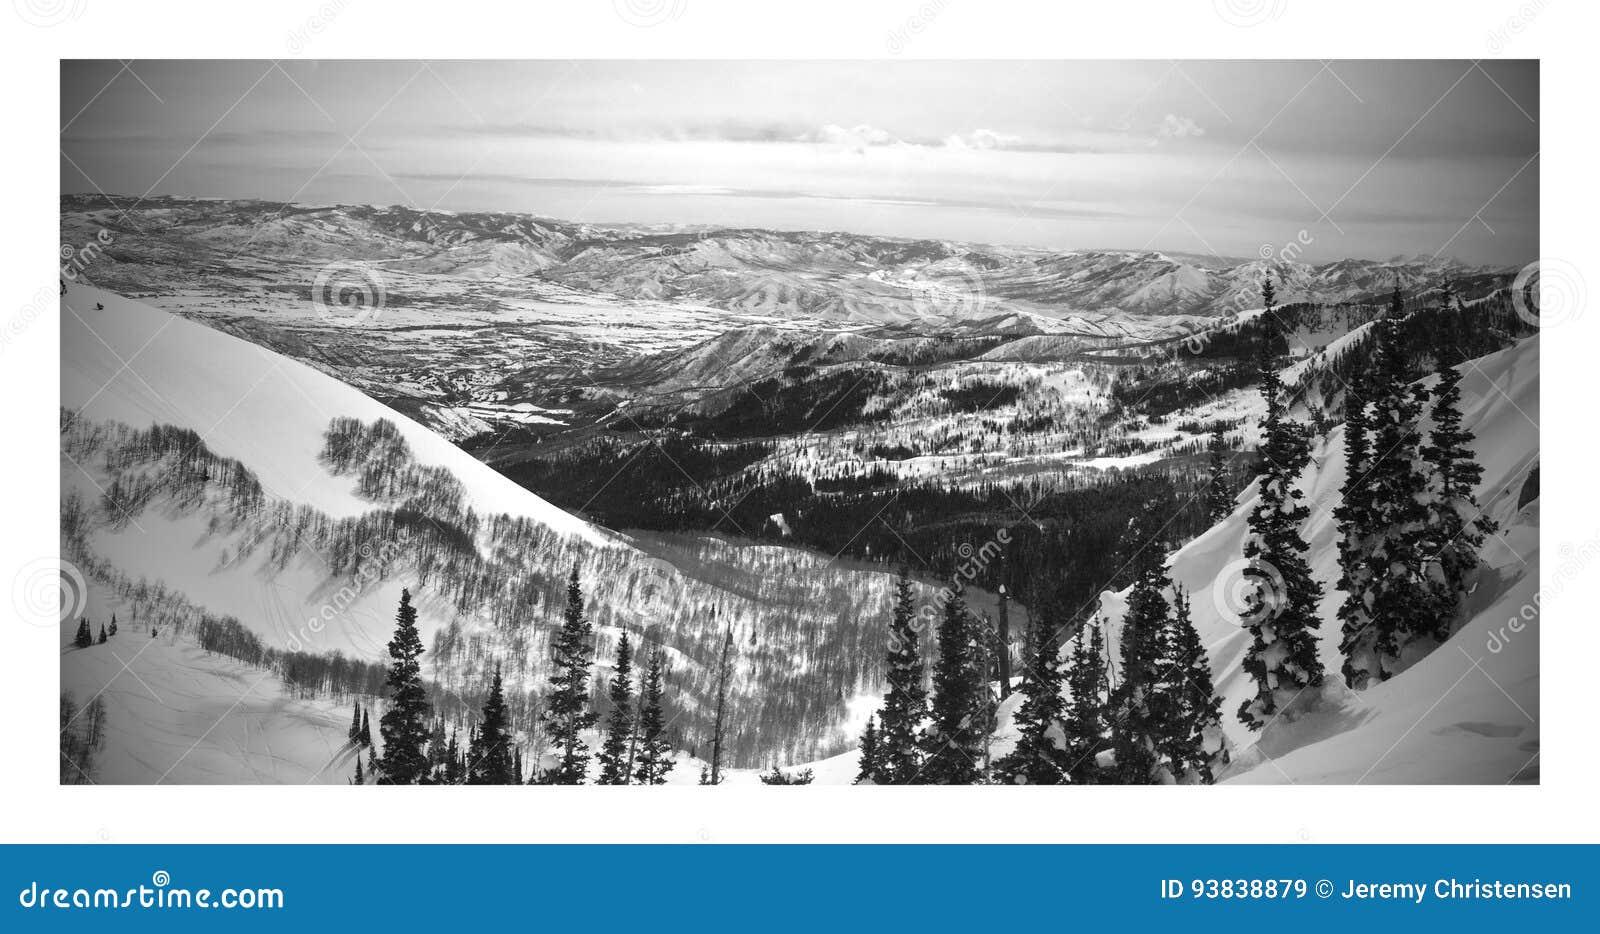 black and white winter landscape from brighton ski resort in wasatch